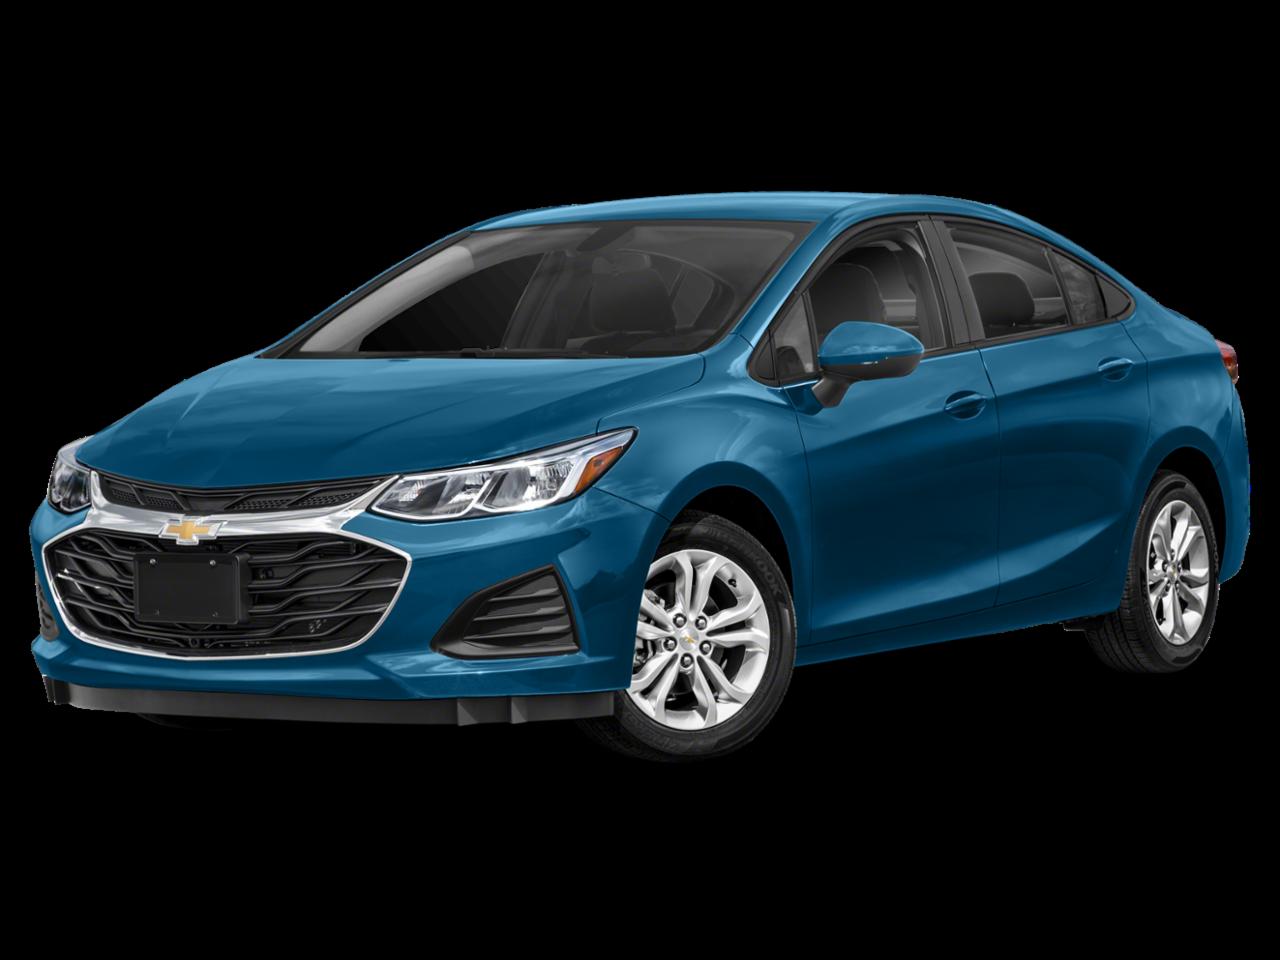 Chevrolet 2019 Cruze LT